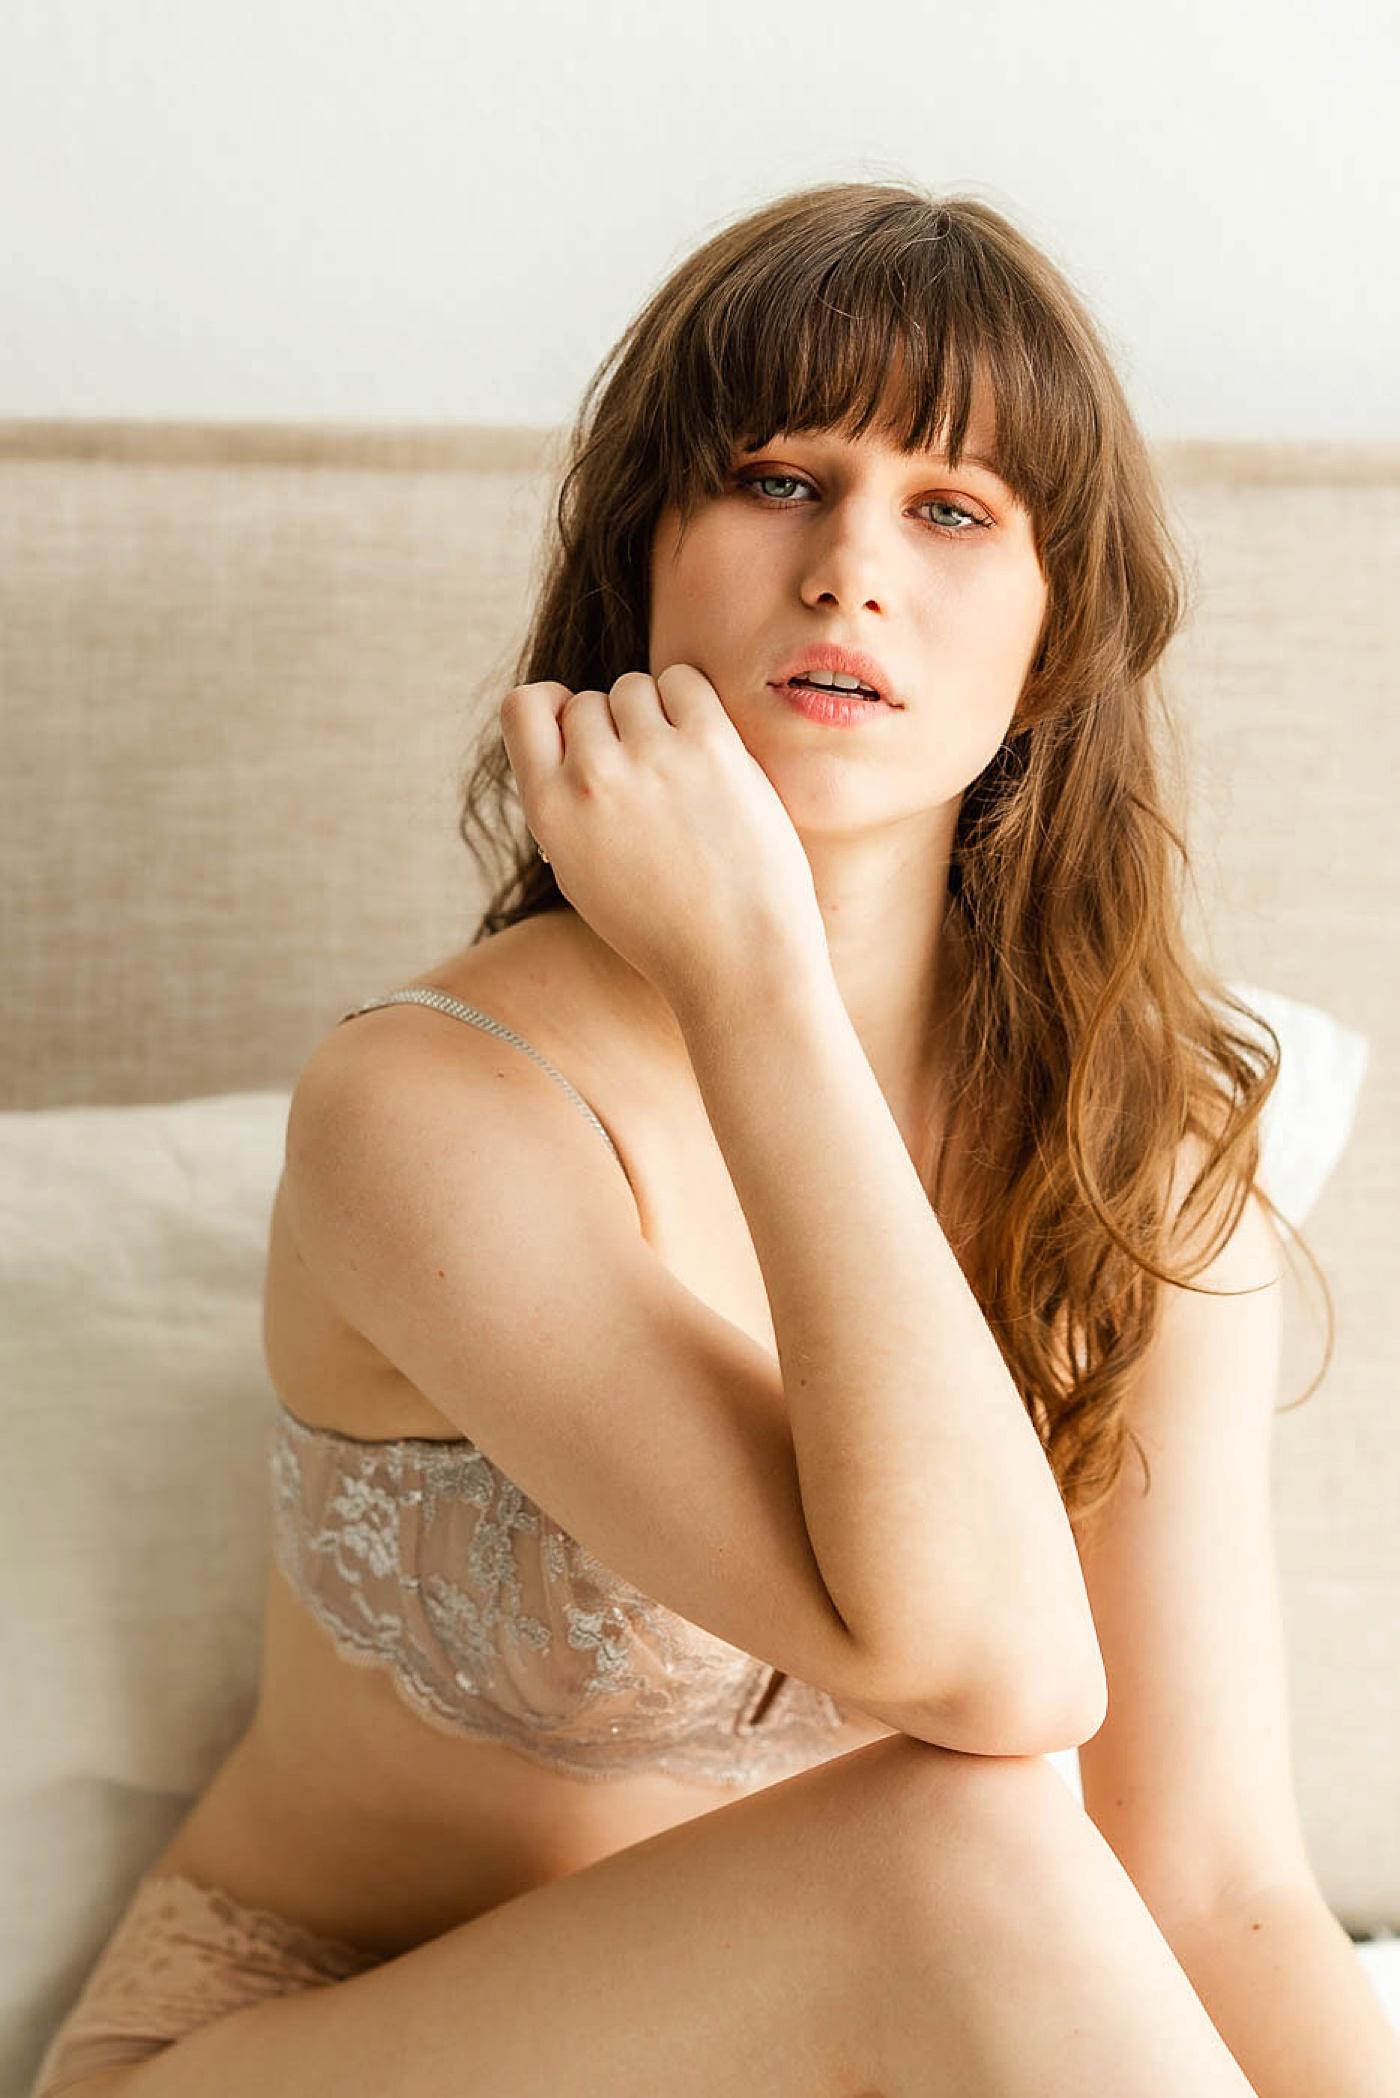 austin_intimate_lifestyle_photographer_boudoir_0524.jpg